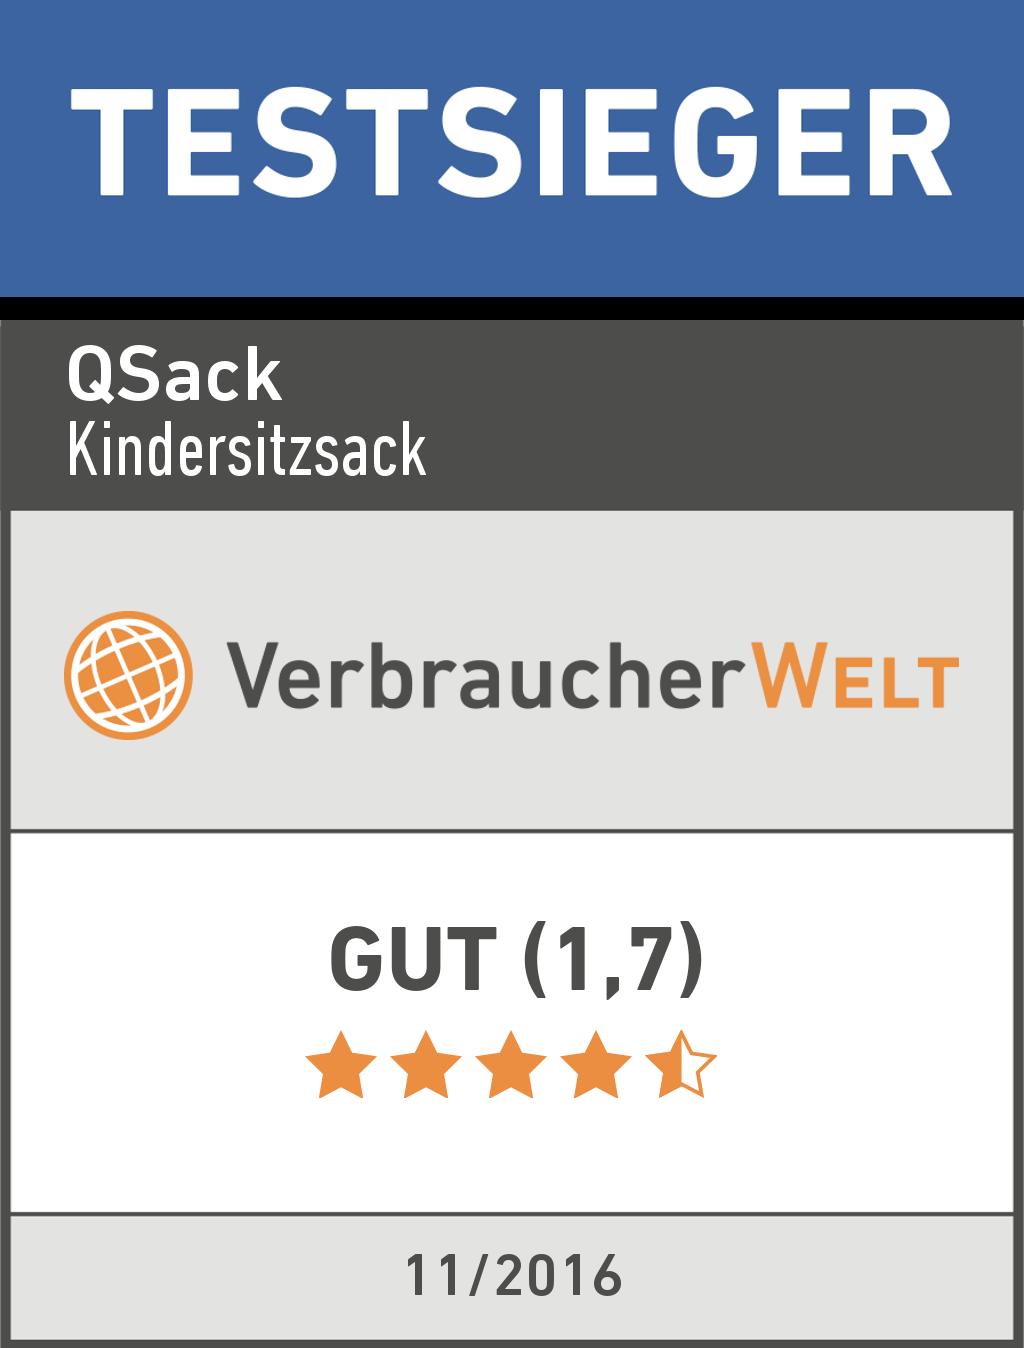 QSack Kinder Sitzsack Testsieger